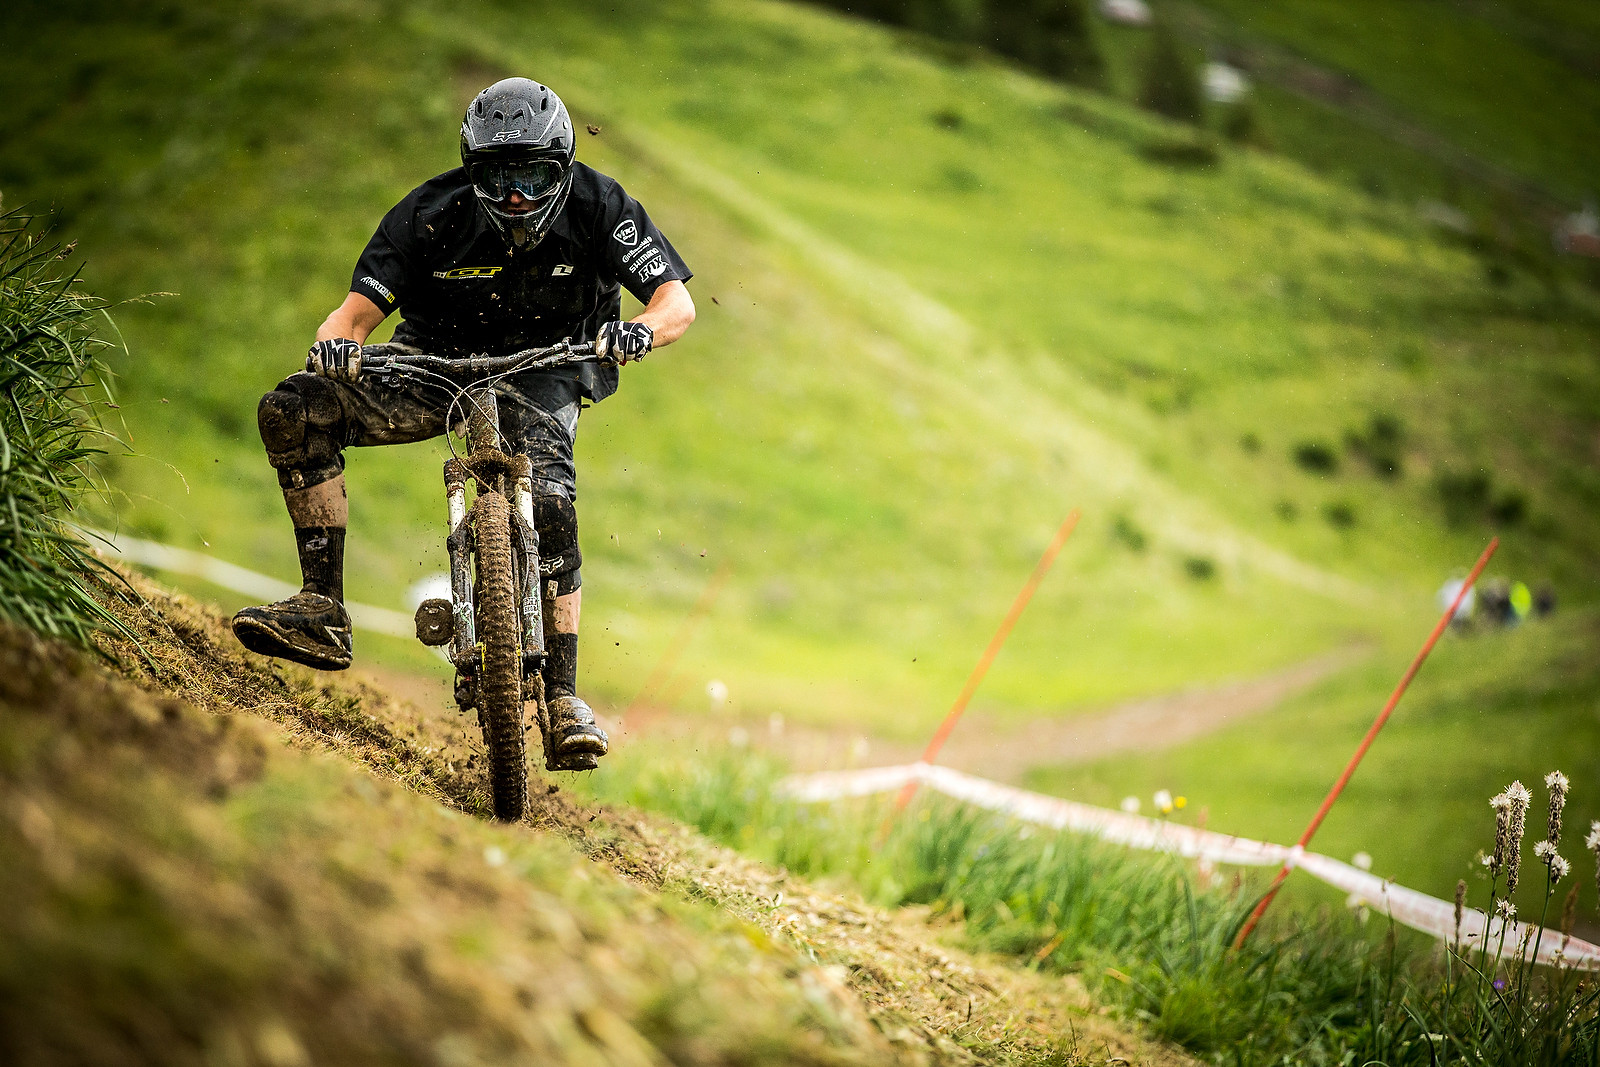 GT's Mark Maurissen Testing Cut Spikes at Crankworx L2A - Crankworx L2A - Air Downhill Photo Action - Mountain Biking Pictures - Vital MTB